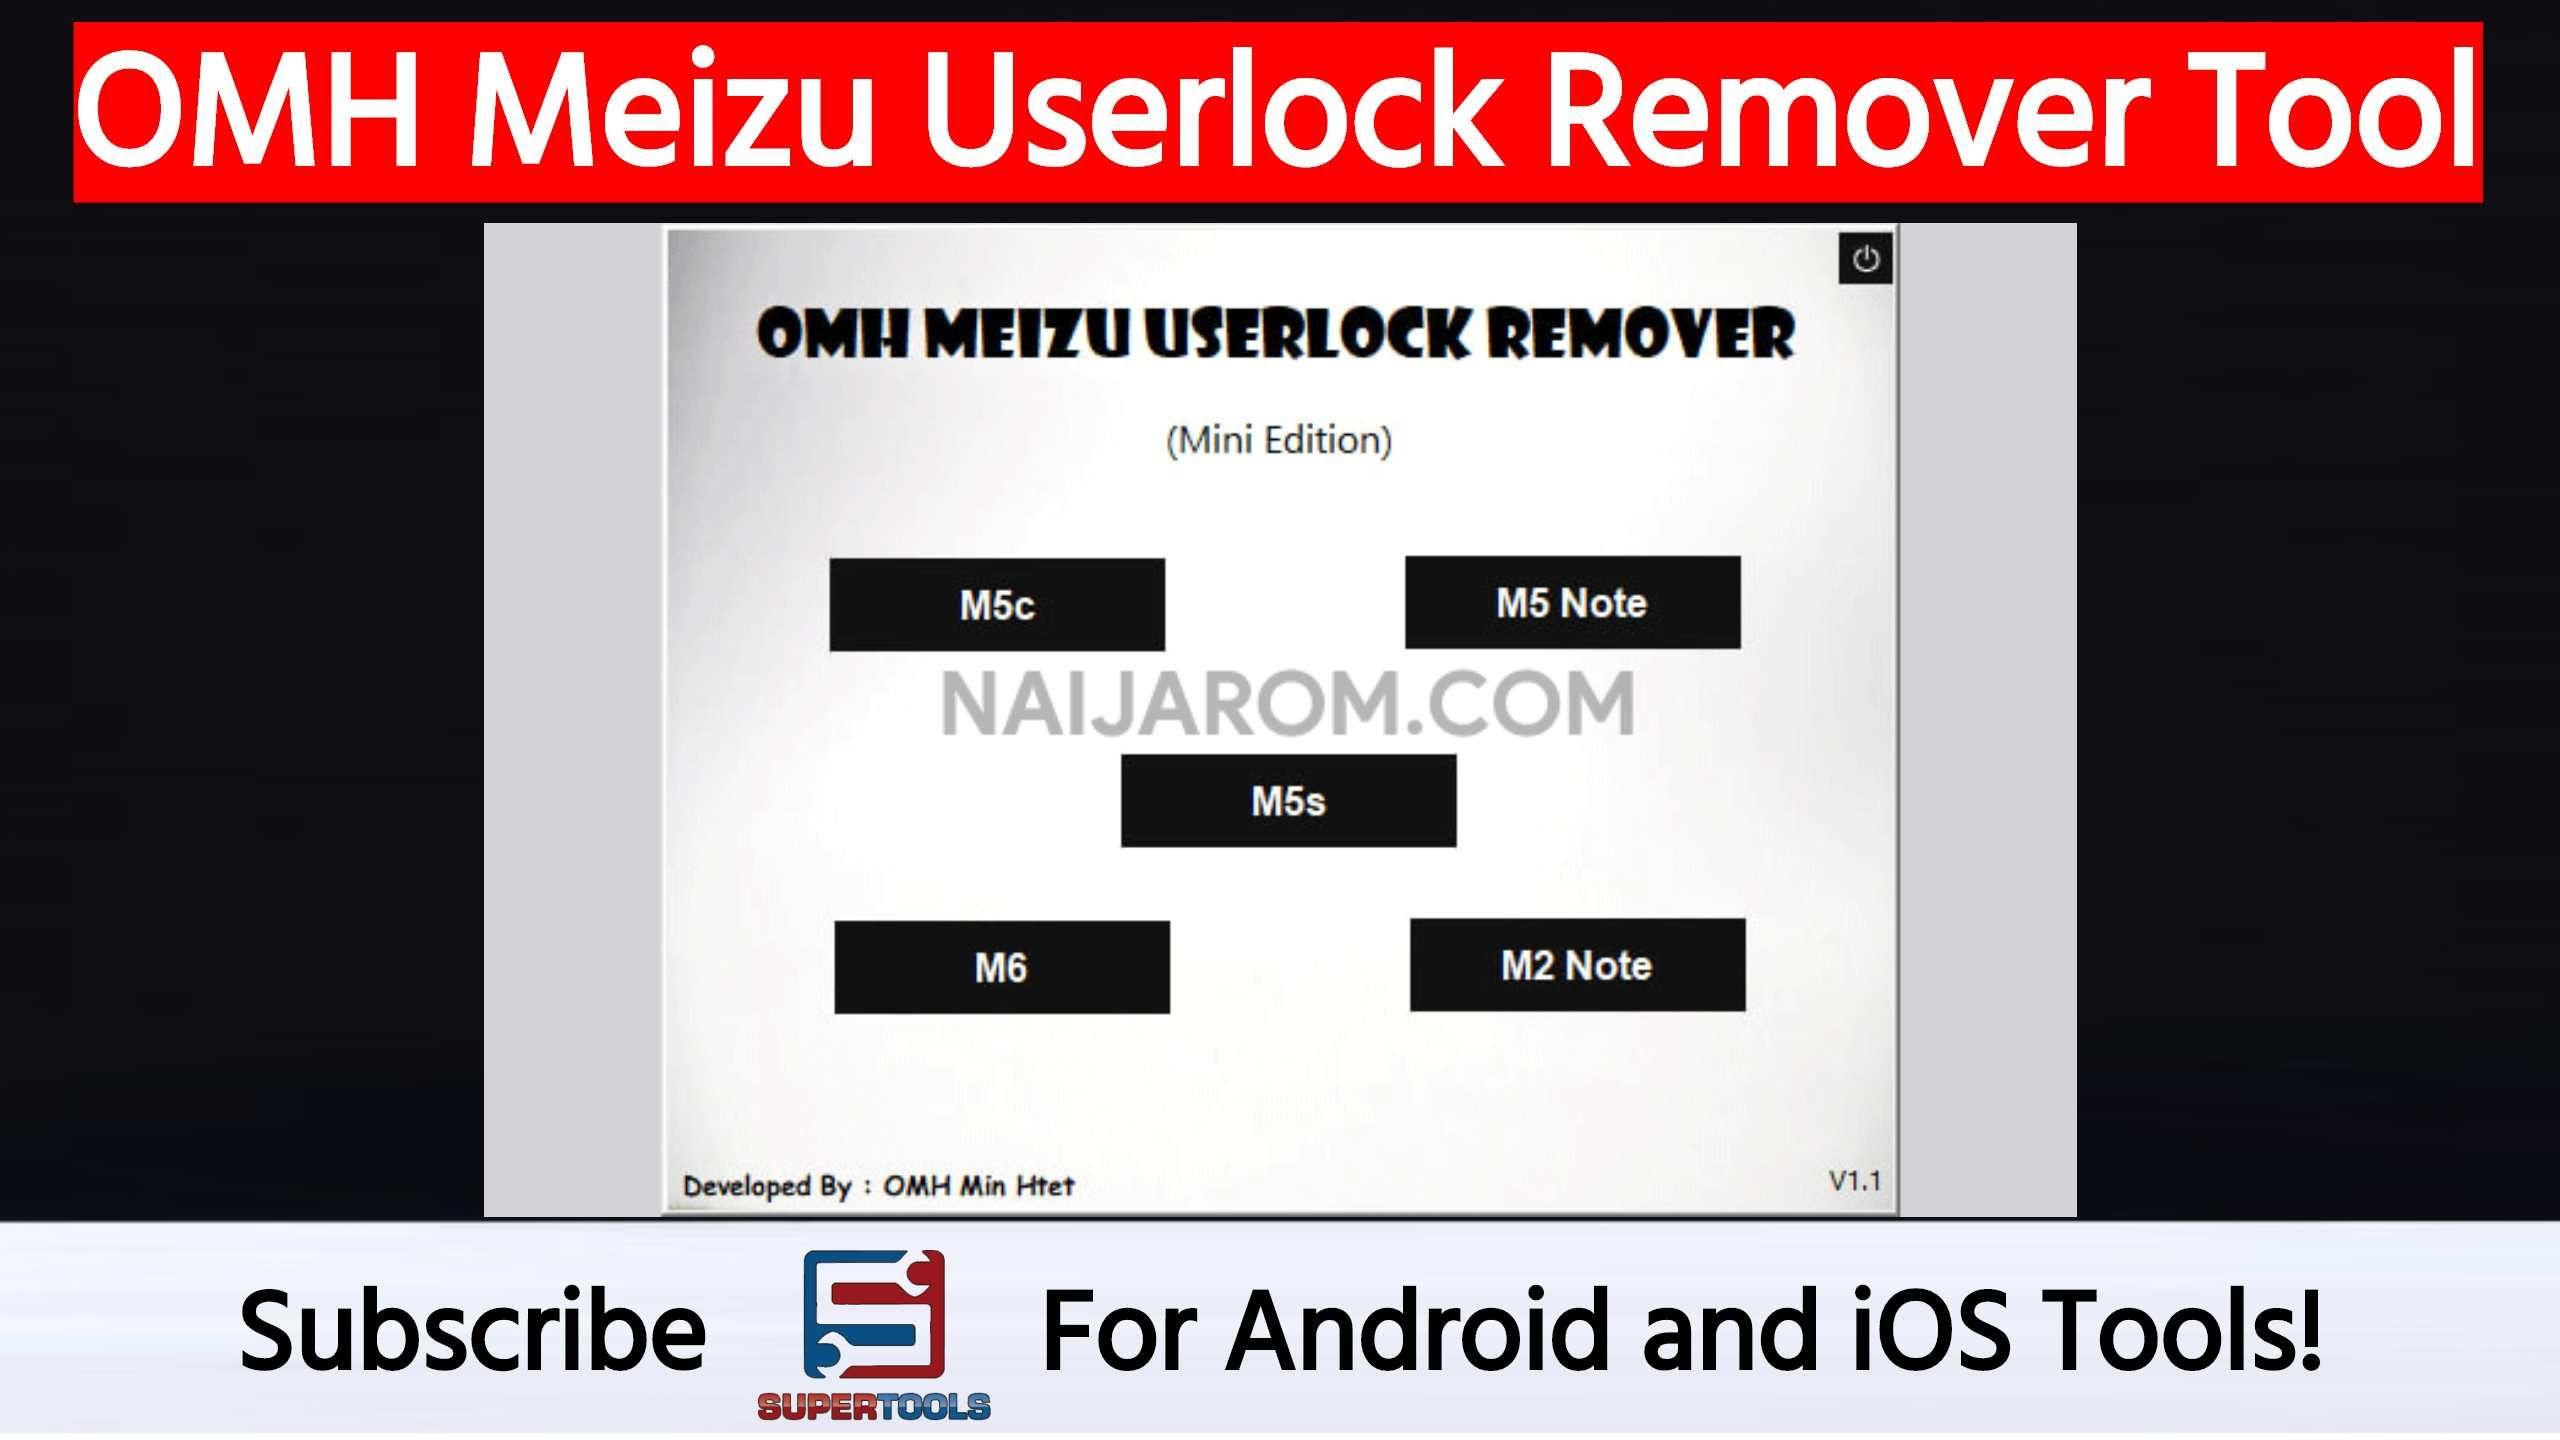 OMH Meizu Userlock Tool will help you to remove the userlock